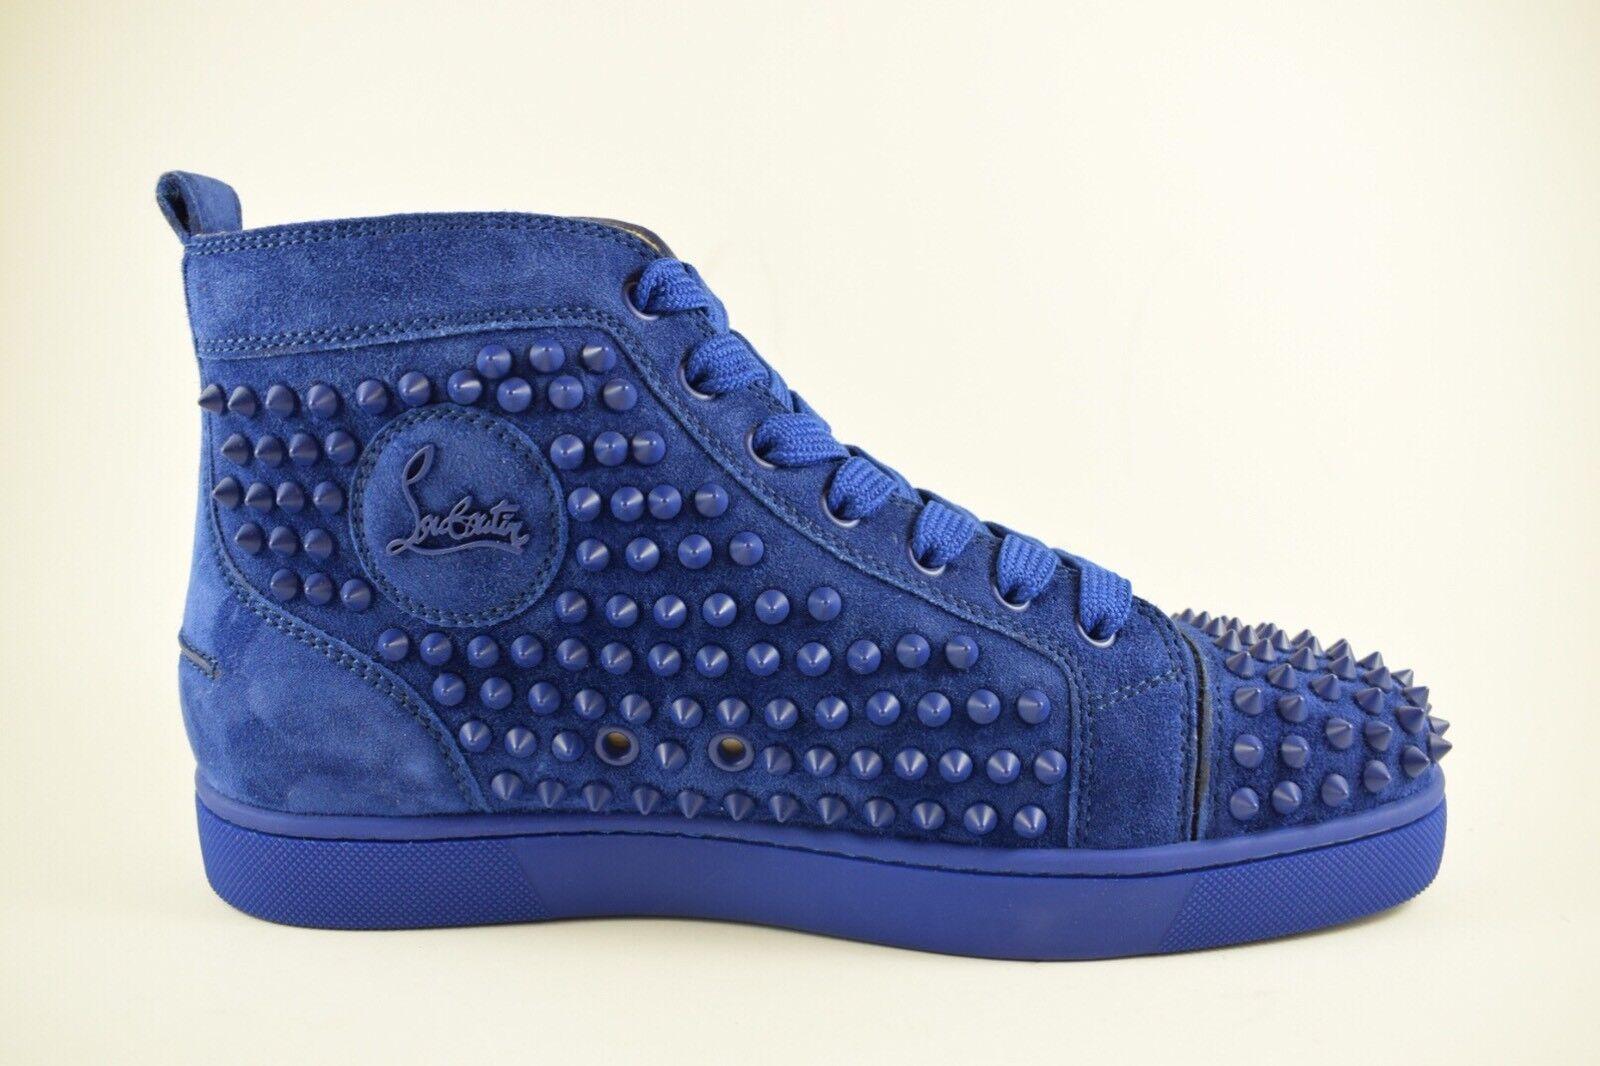 Scarpe casual da uomo  Christian Louboutin Atlantic Blue Matte Louis Spikes Size 39